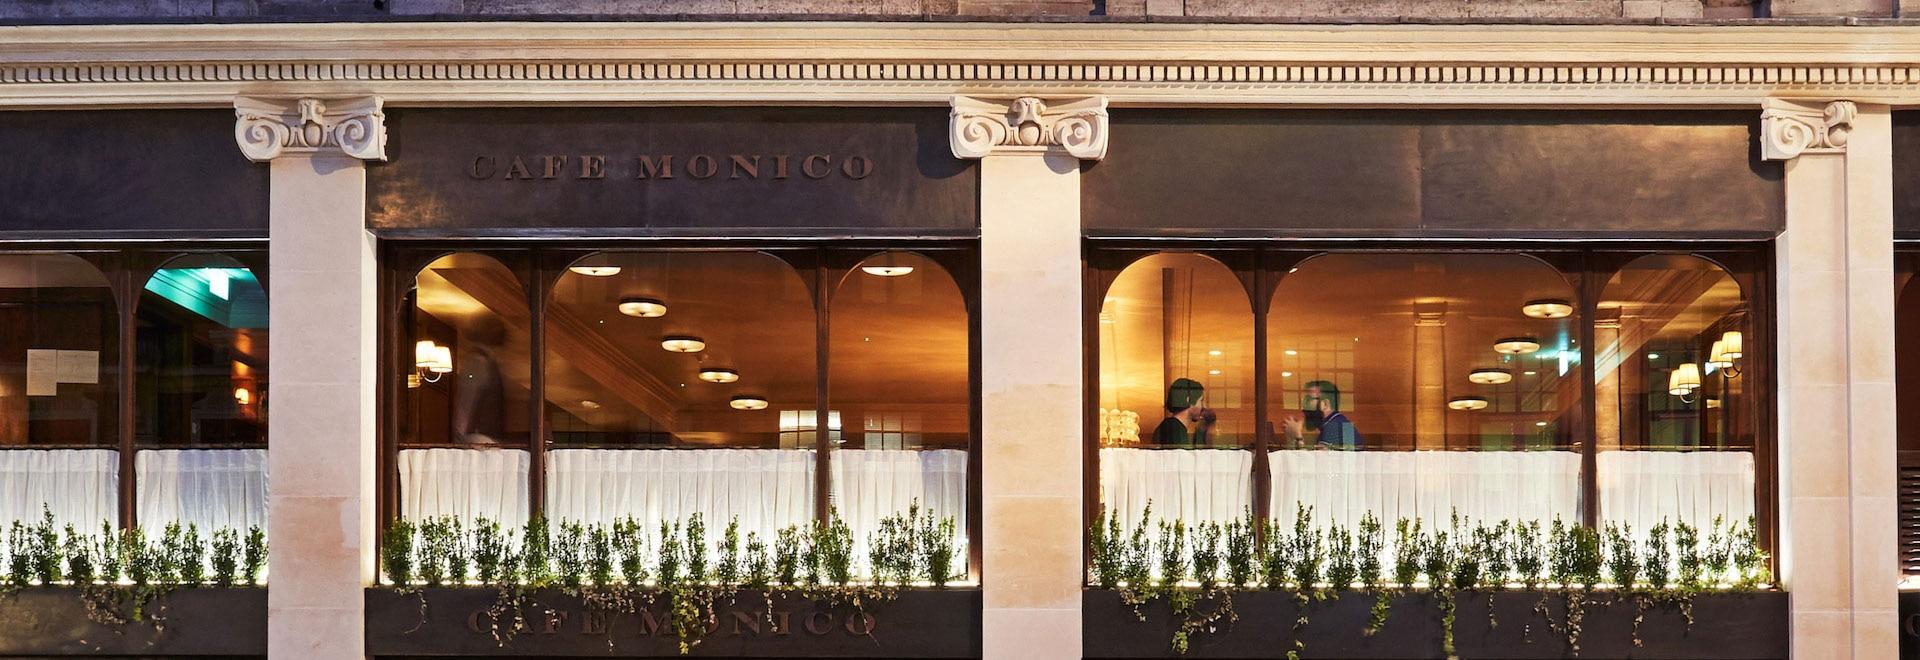 Café Monico, London, UK